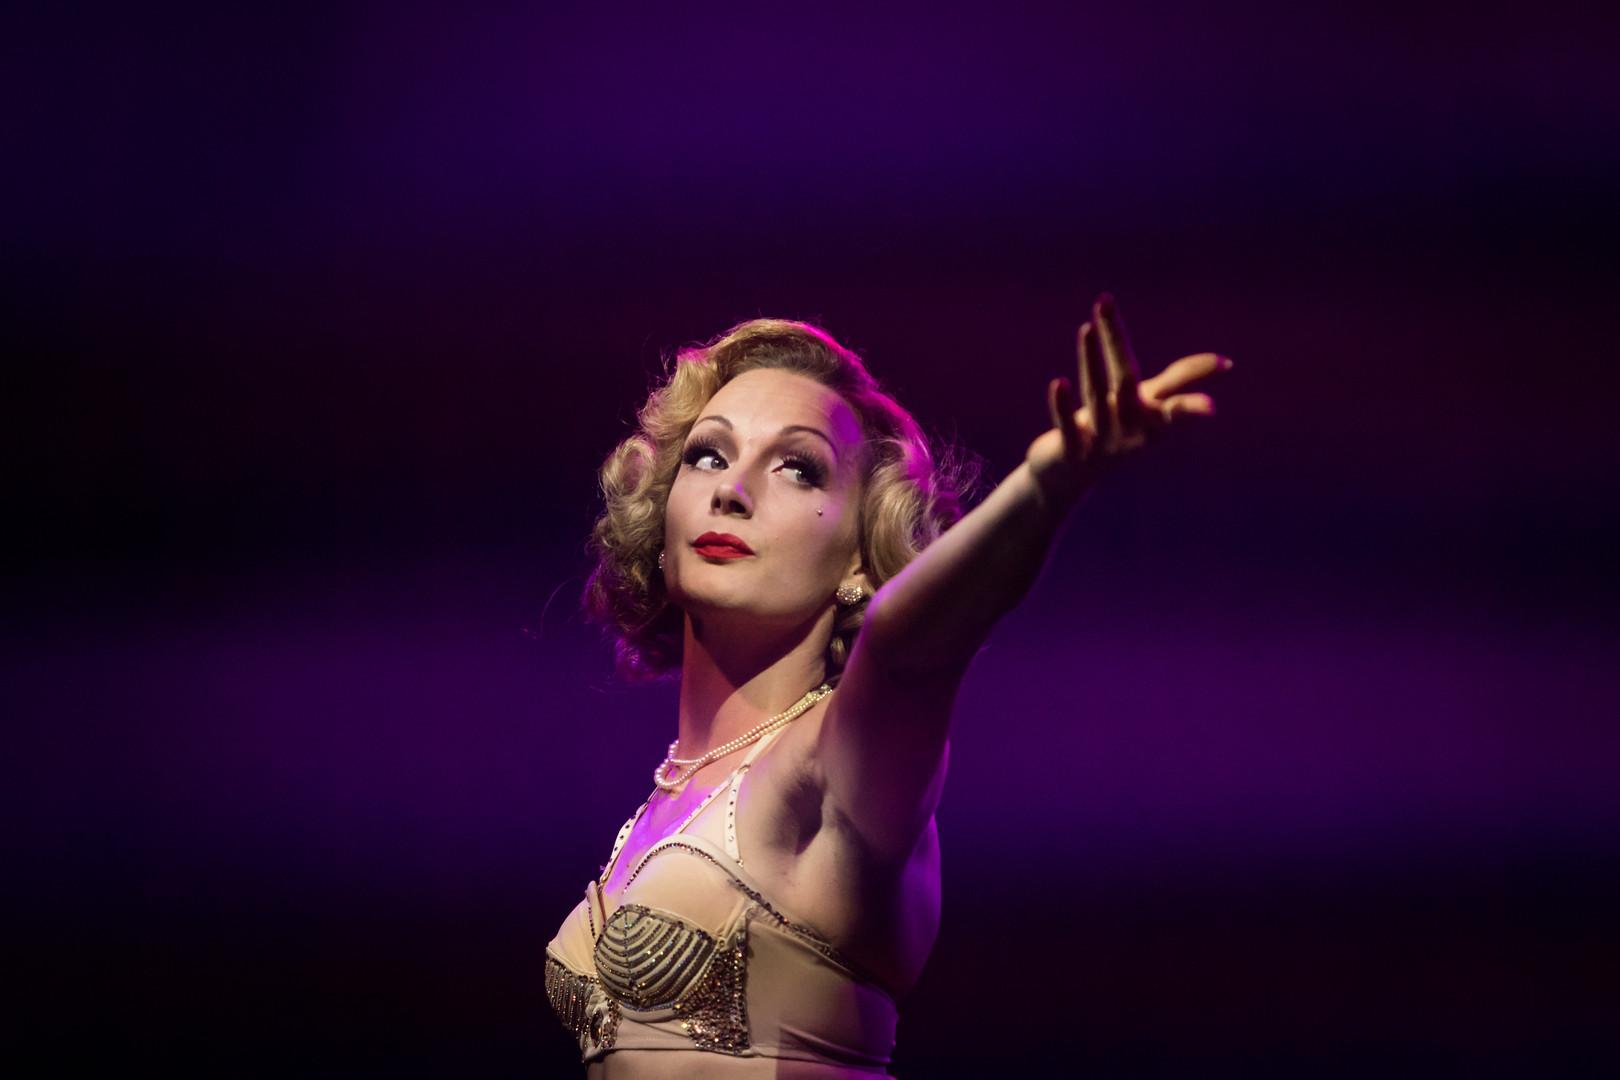 Ulrike Storch Footjuggler Antpodist | Marlene Dietrich Lookalike Impersonator | Vintage Model | Circus Cabaret Star